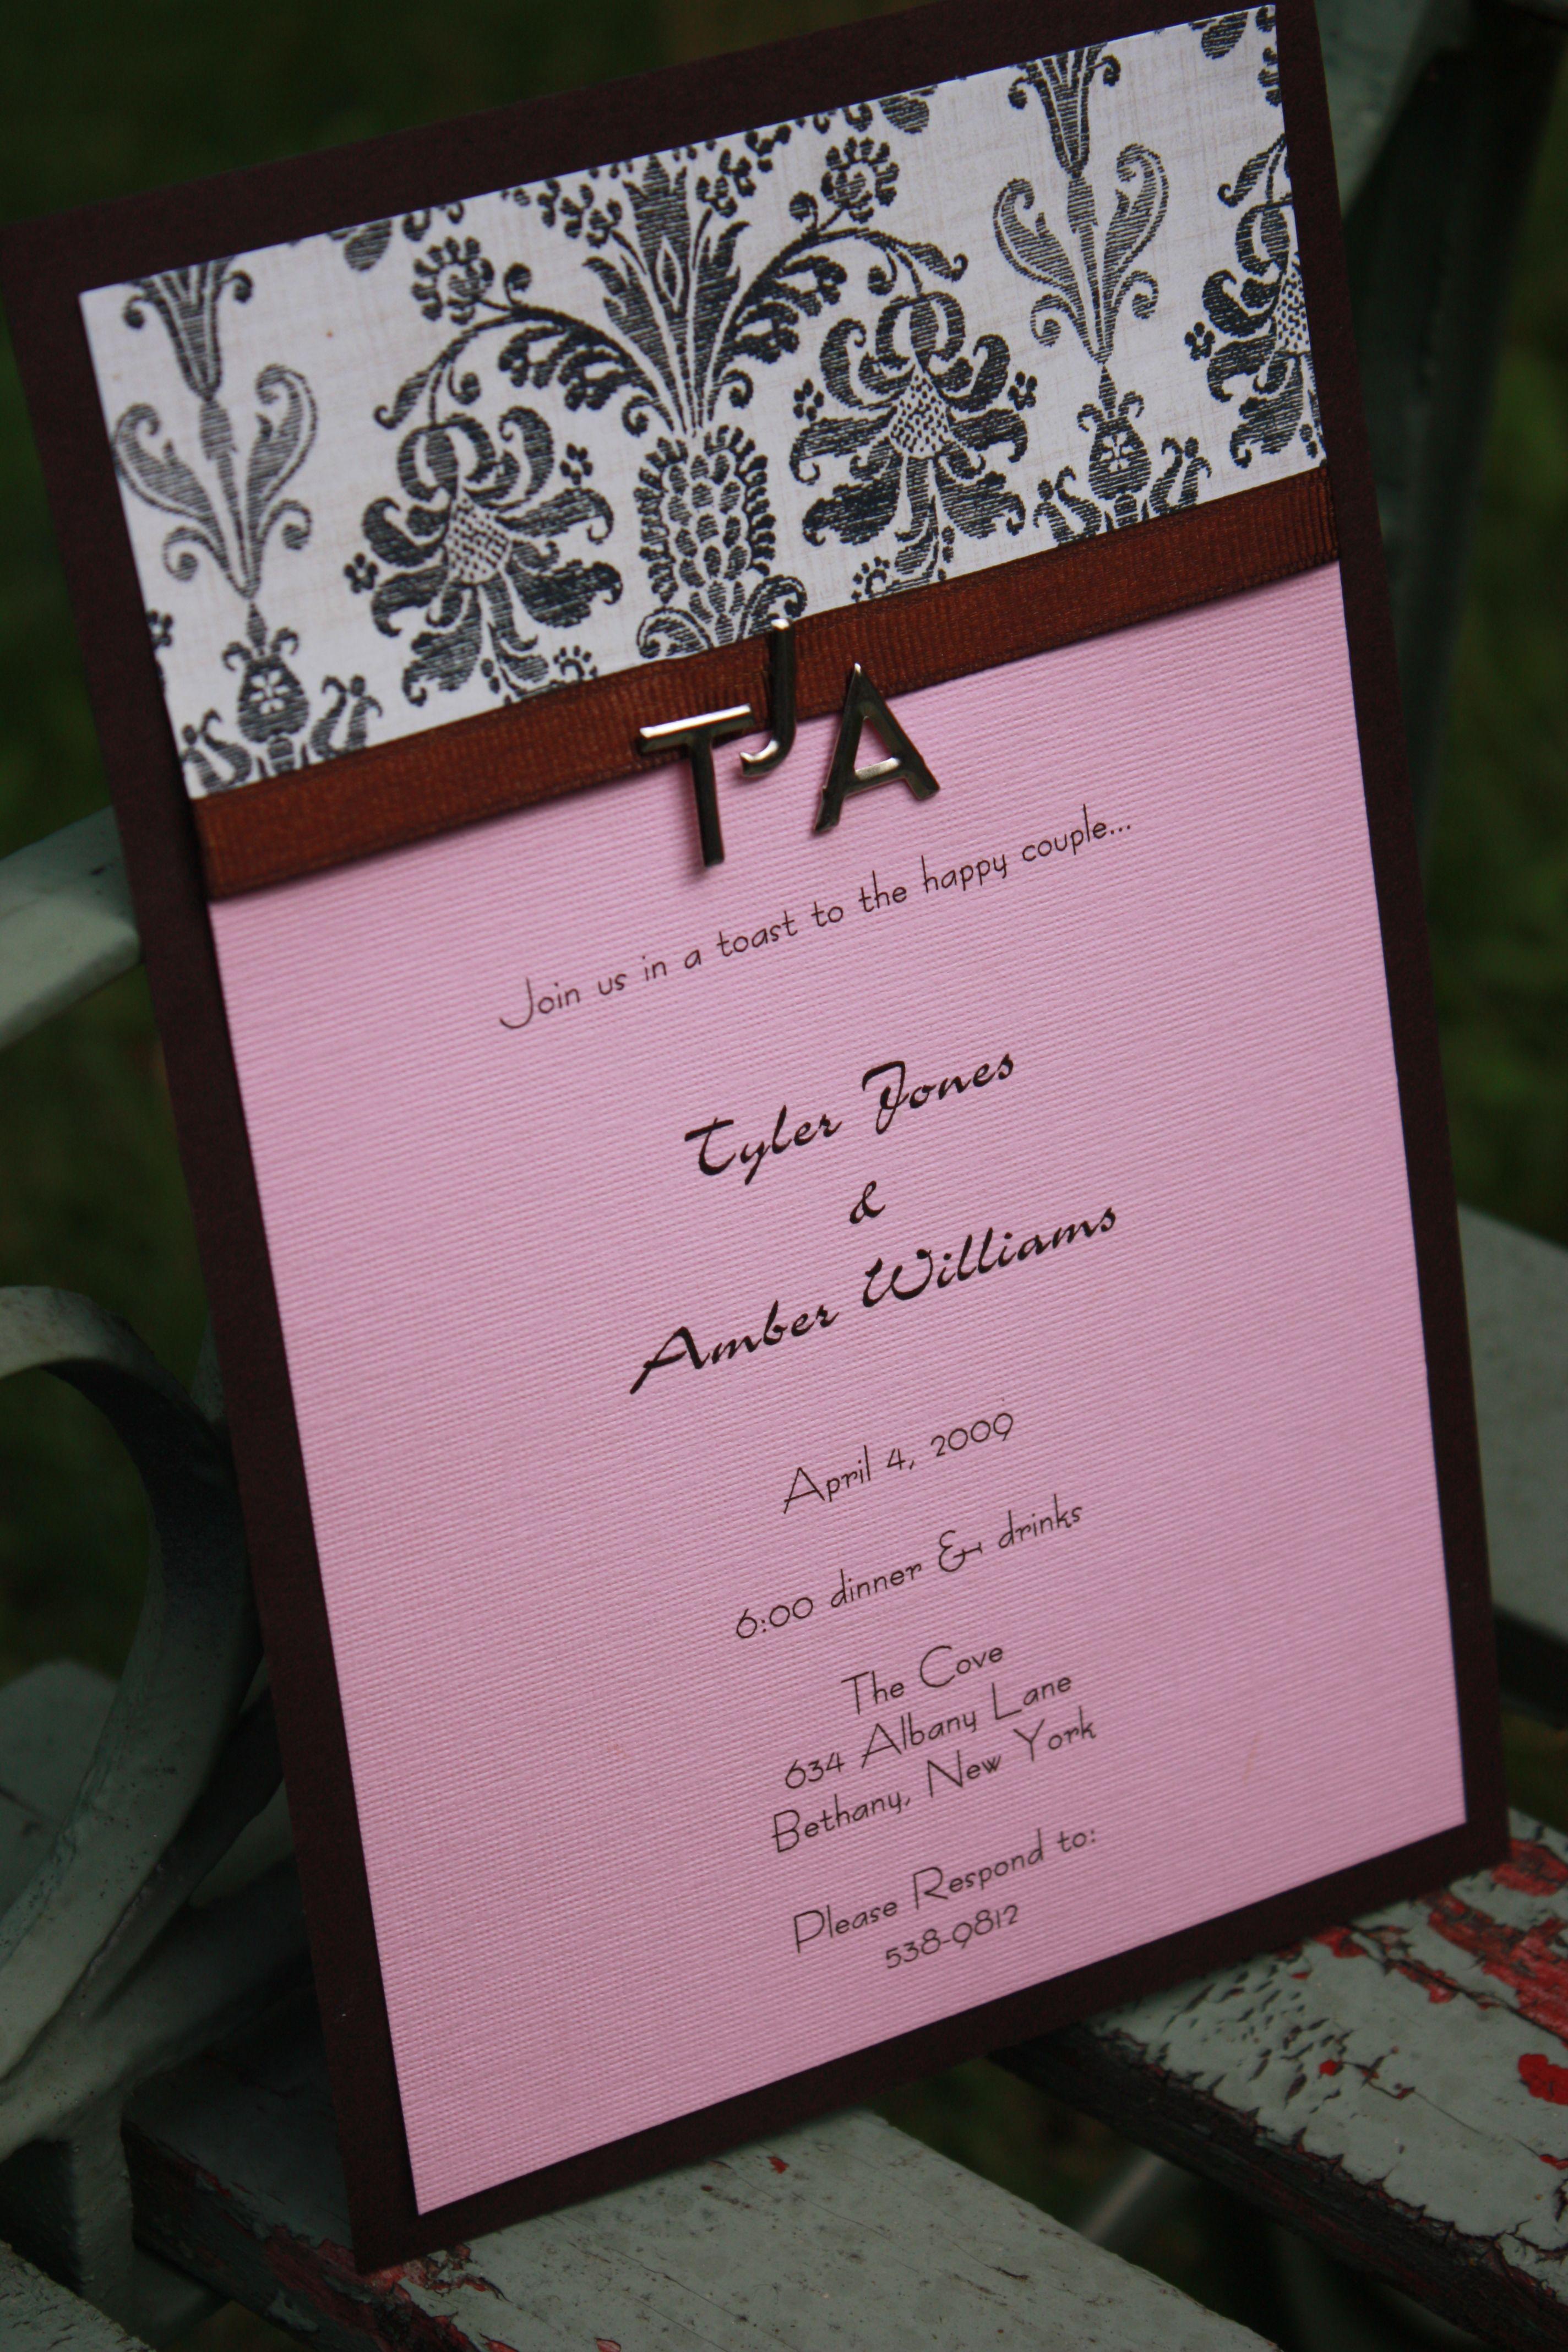 homemade invitations-engagement3 | Crafts - Invitation Ideas ...